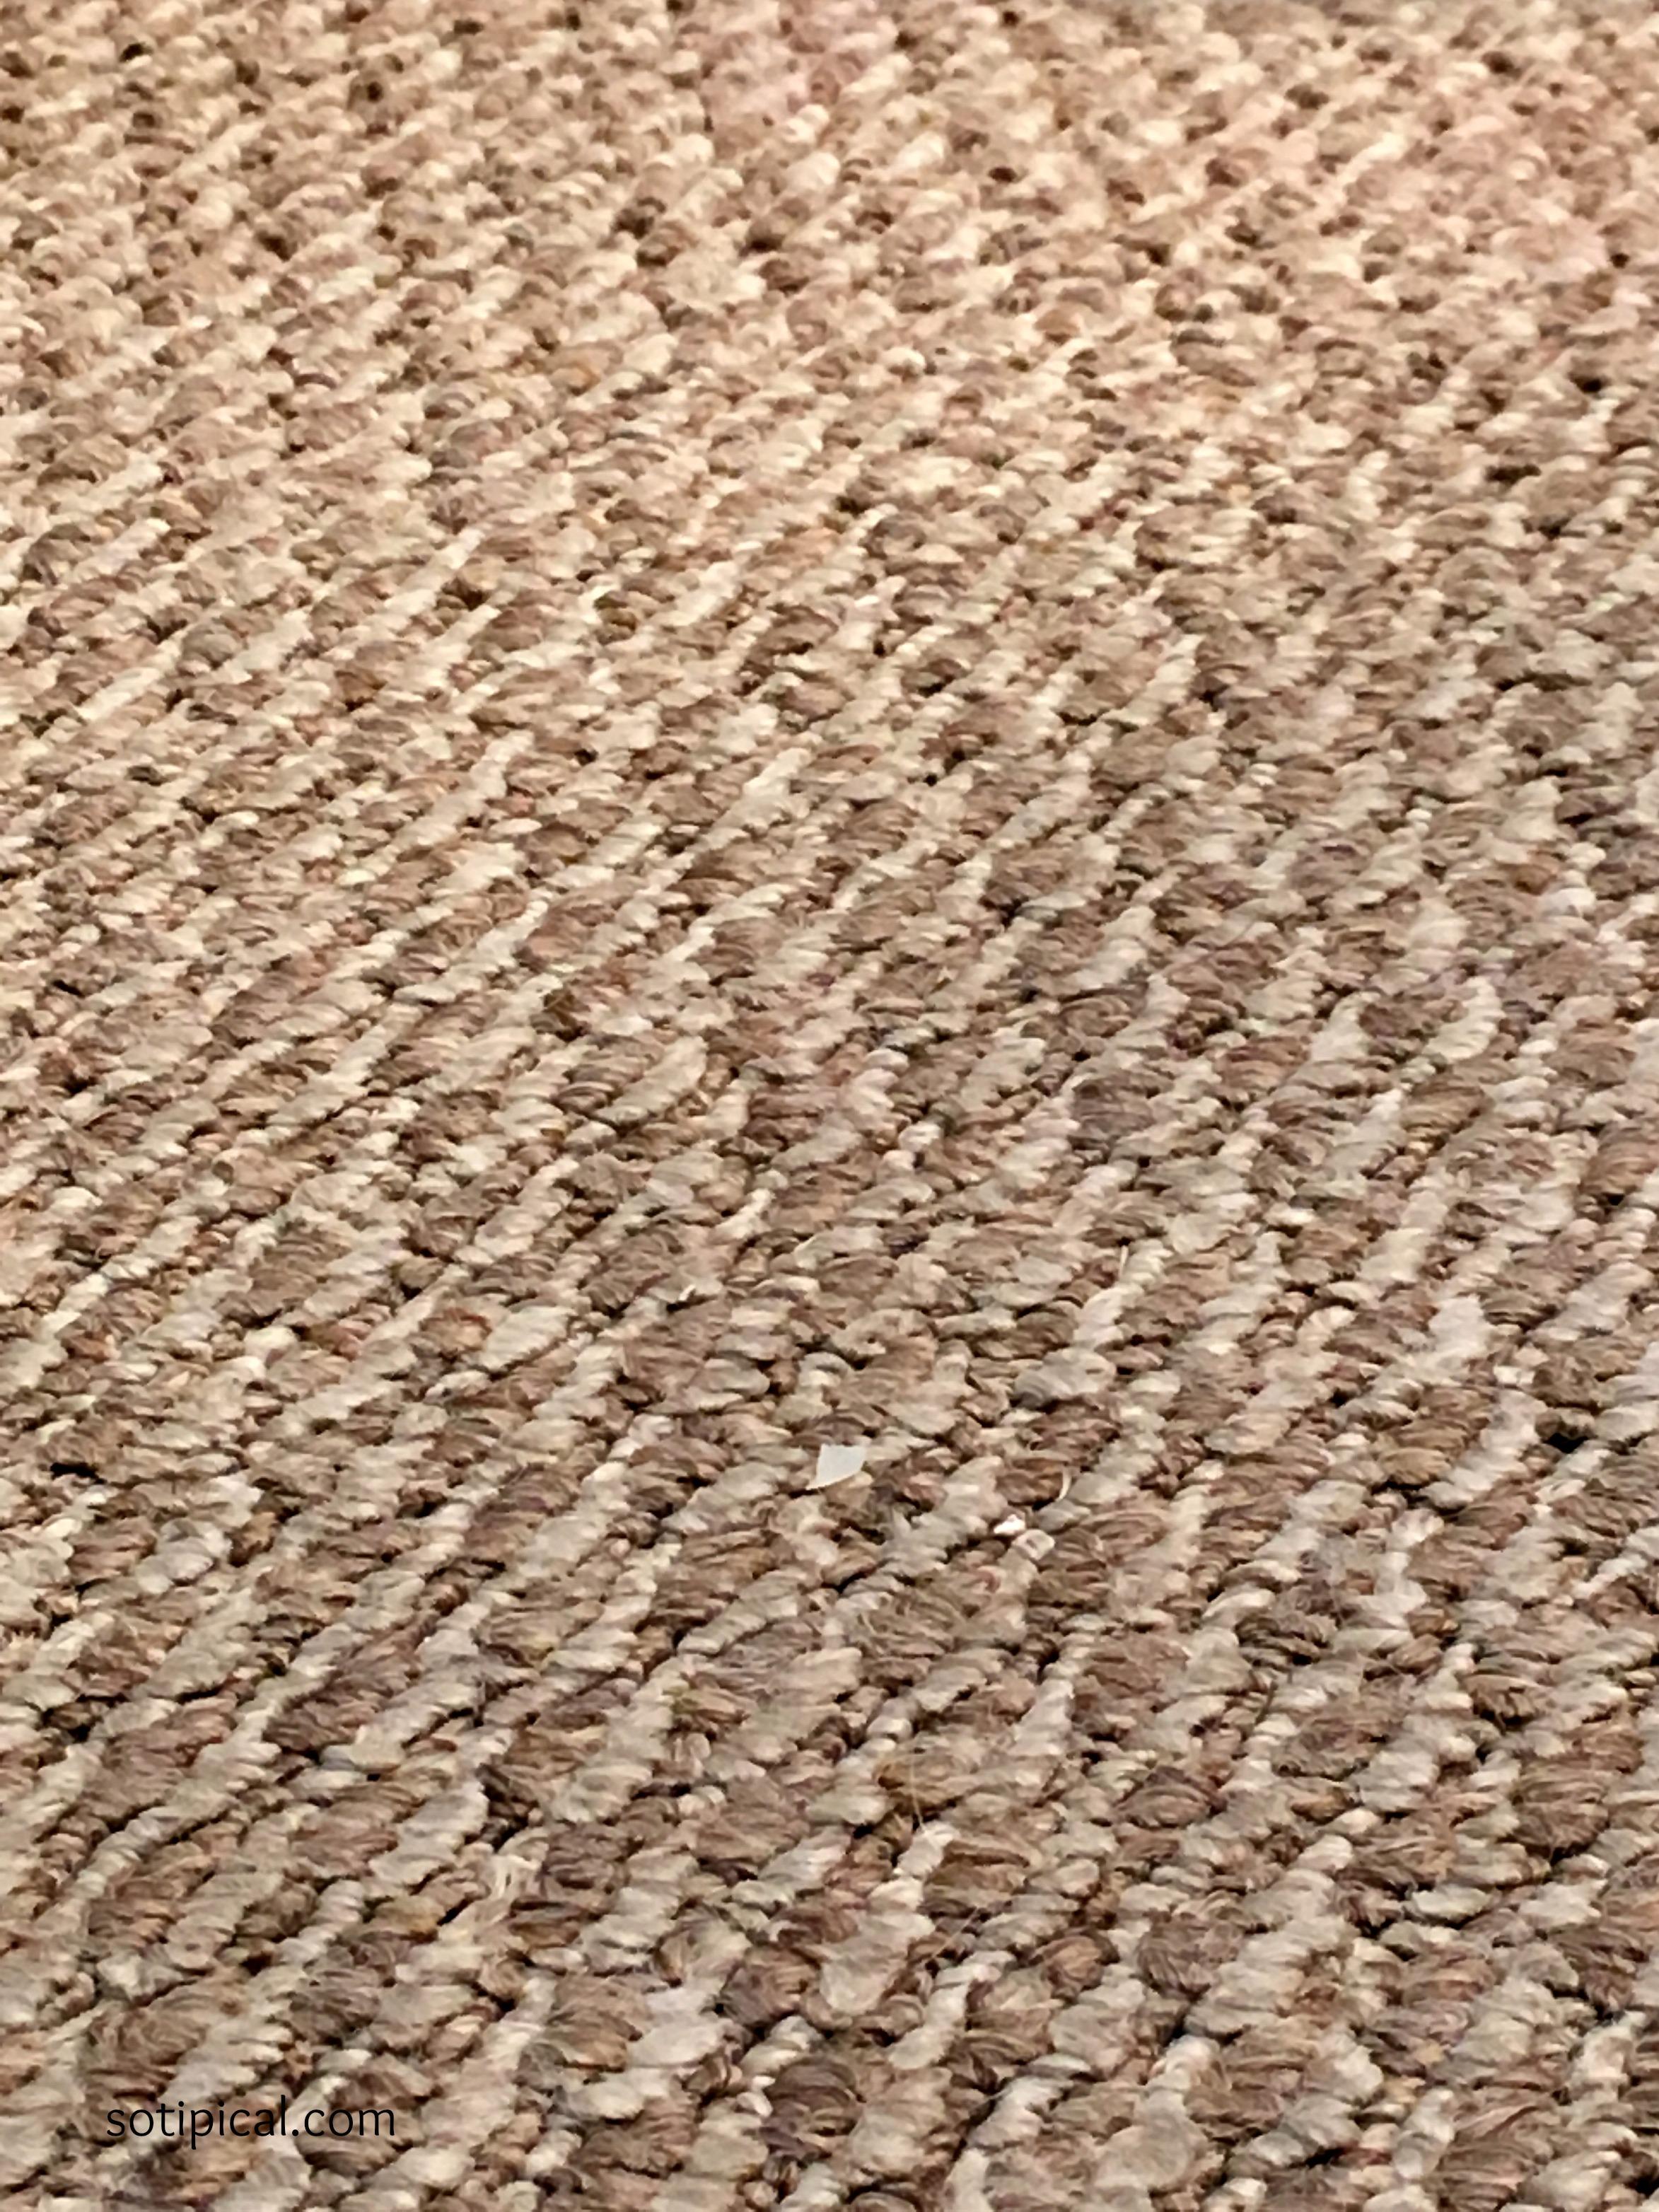 Cute Sally Hansen Gel Nail Polish Kit Huge Jordana Nail Polish Solid Nail Polish Sticky Nail Flower Art Young Pretty Nail Arts PinkWhat Do You Use To Remove Gel Nail Polish How To Clean Nail Polish Off Carpet   Emsilog